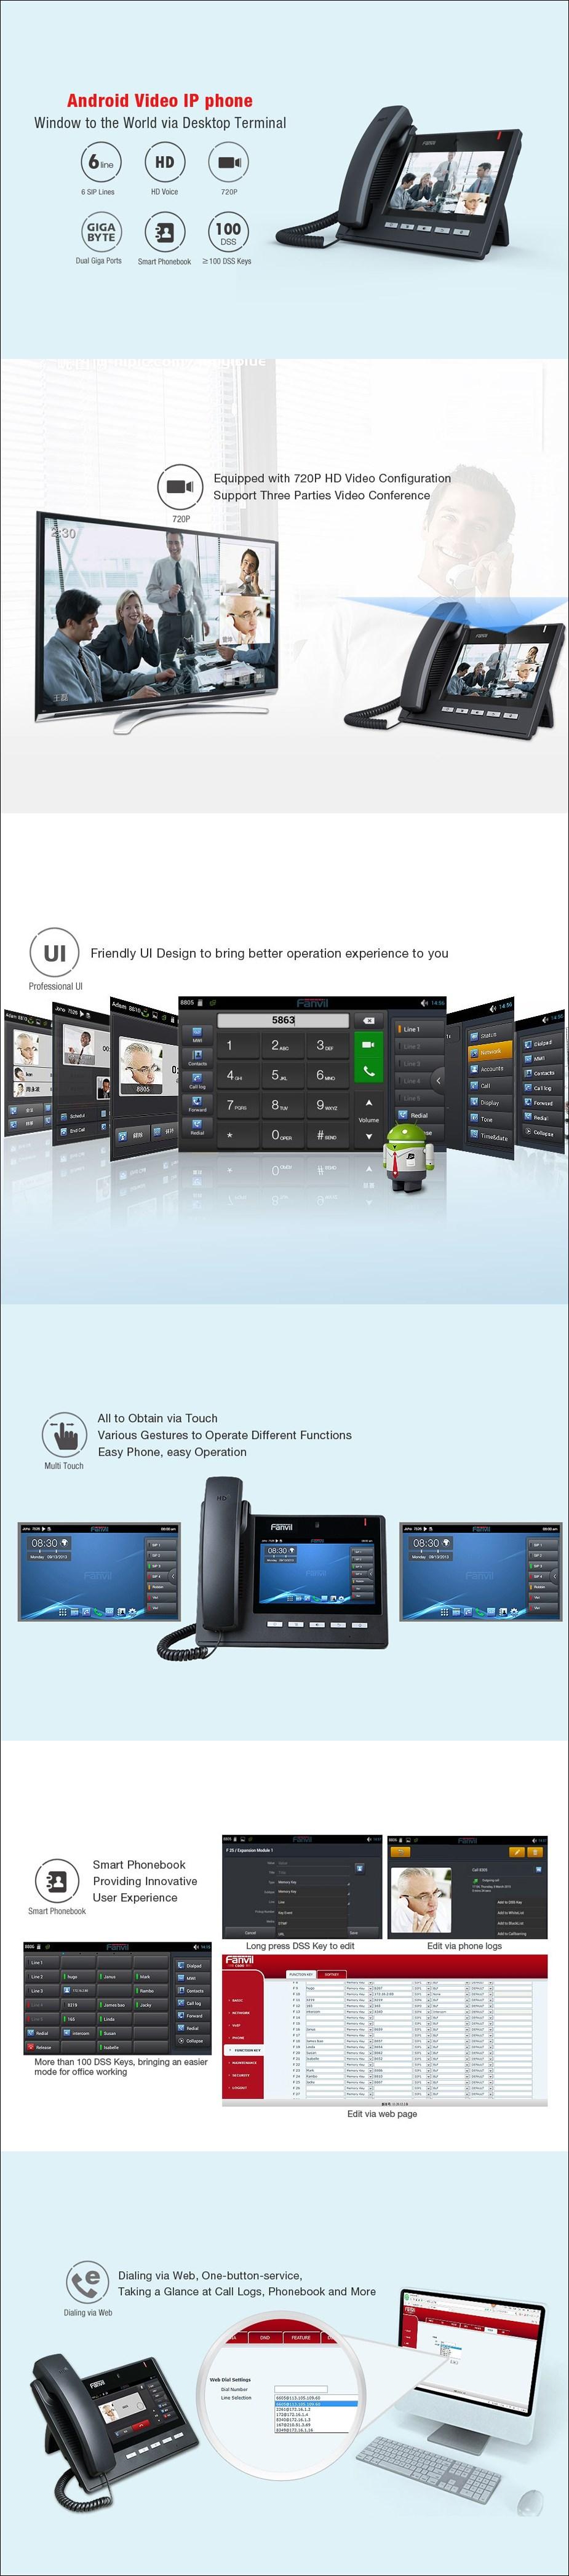 Fanvil C600 6-Line HD Smart Android Video IP Phone - Desktop Overview 1